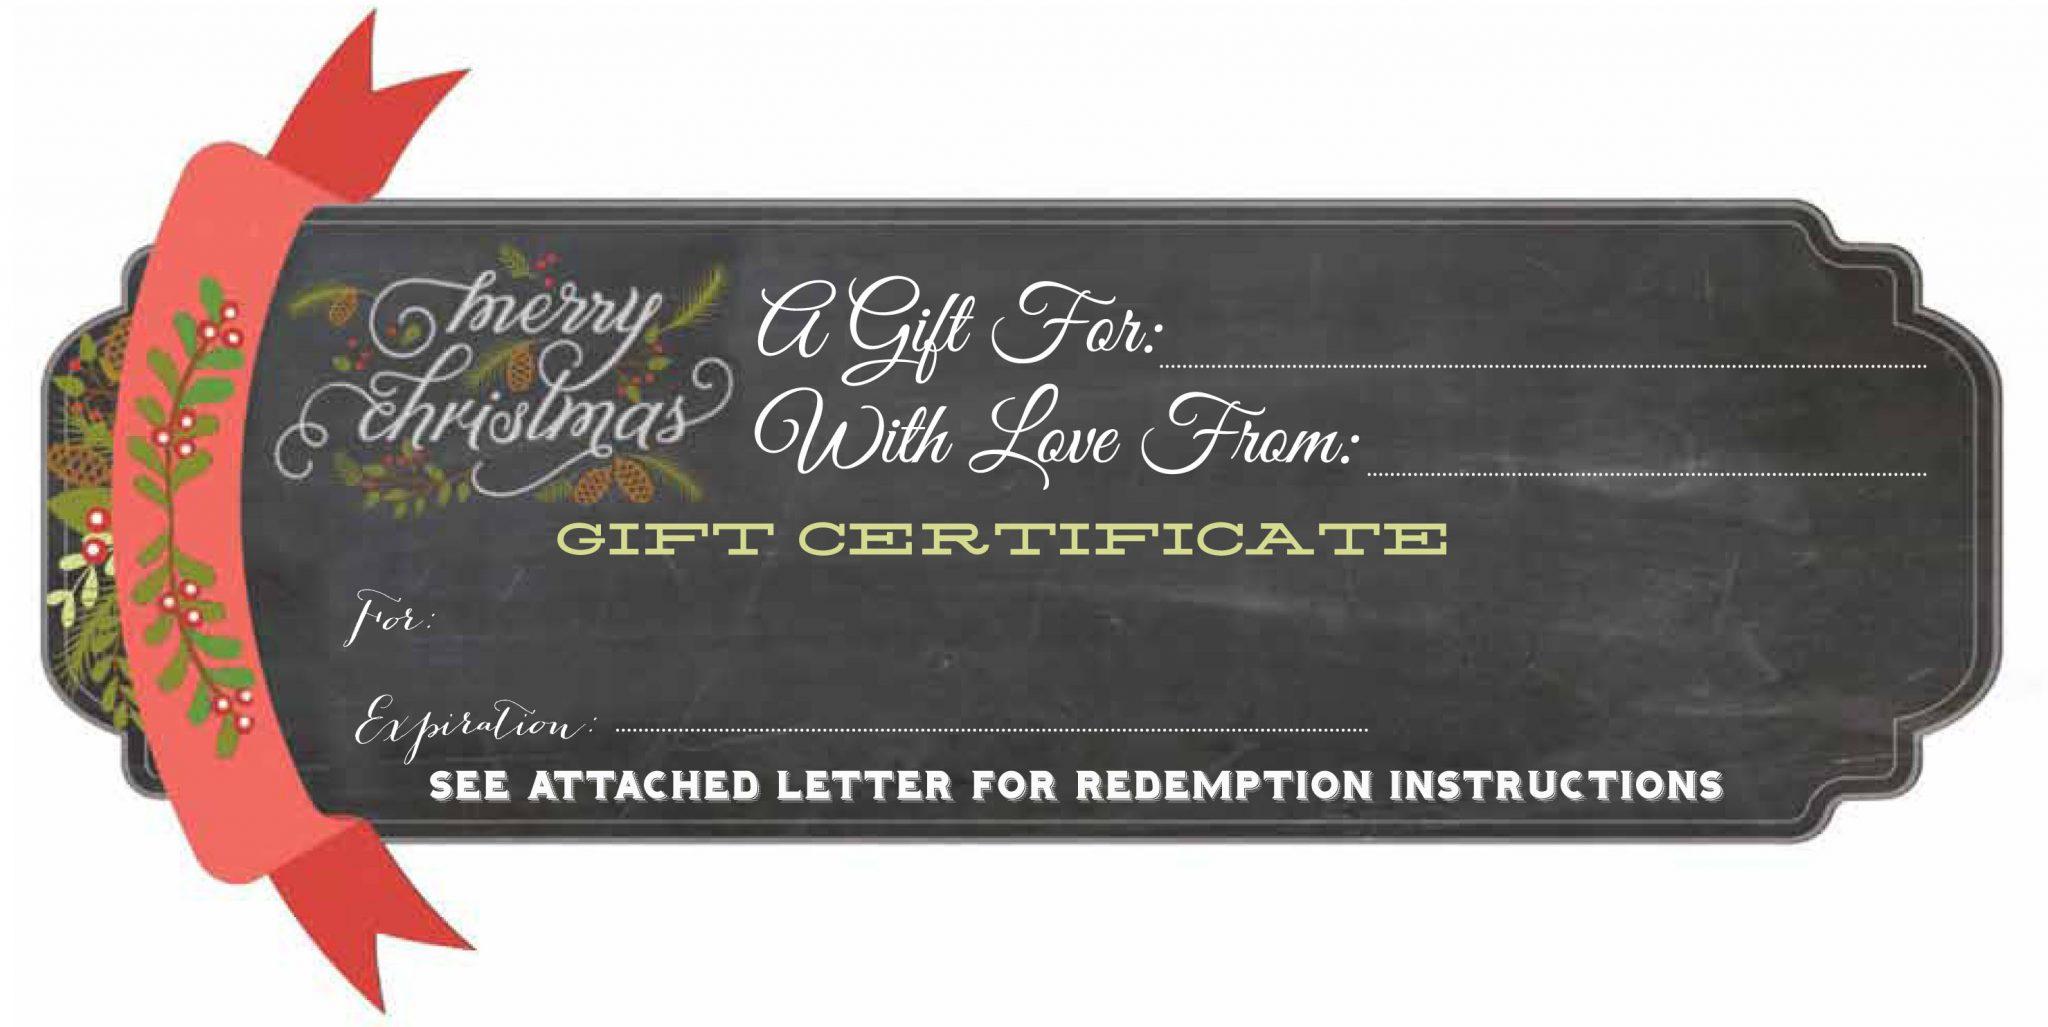 Free Printable Christmas Gift Certificates scottbuckleytk – Christmas Gift Certificates Free